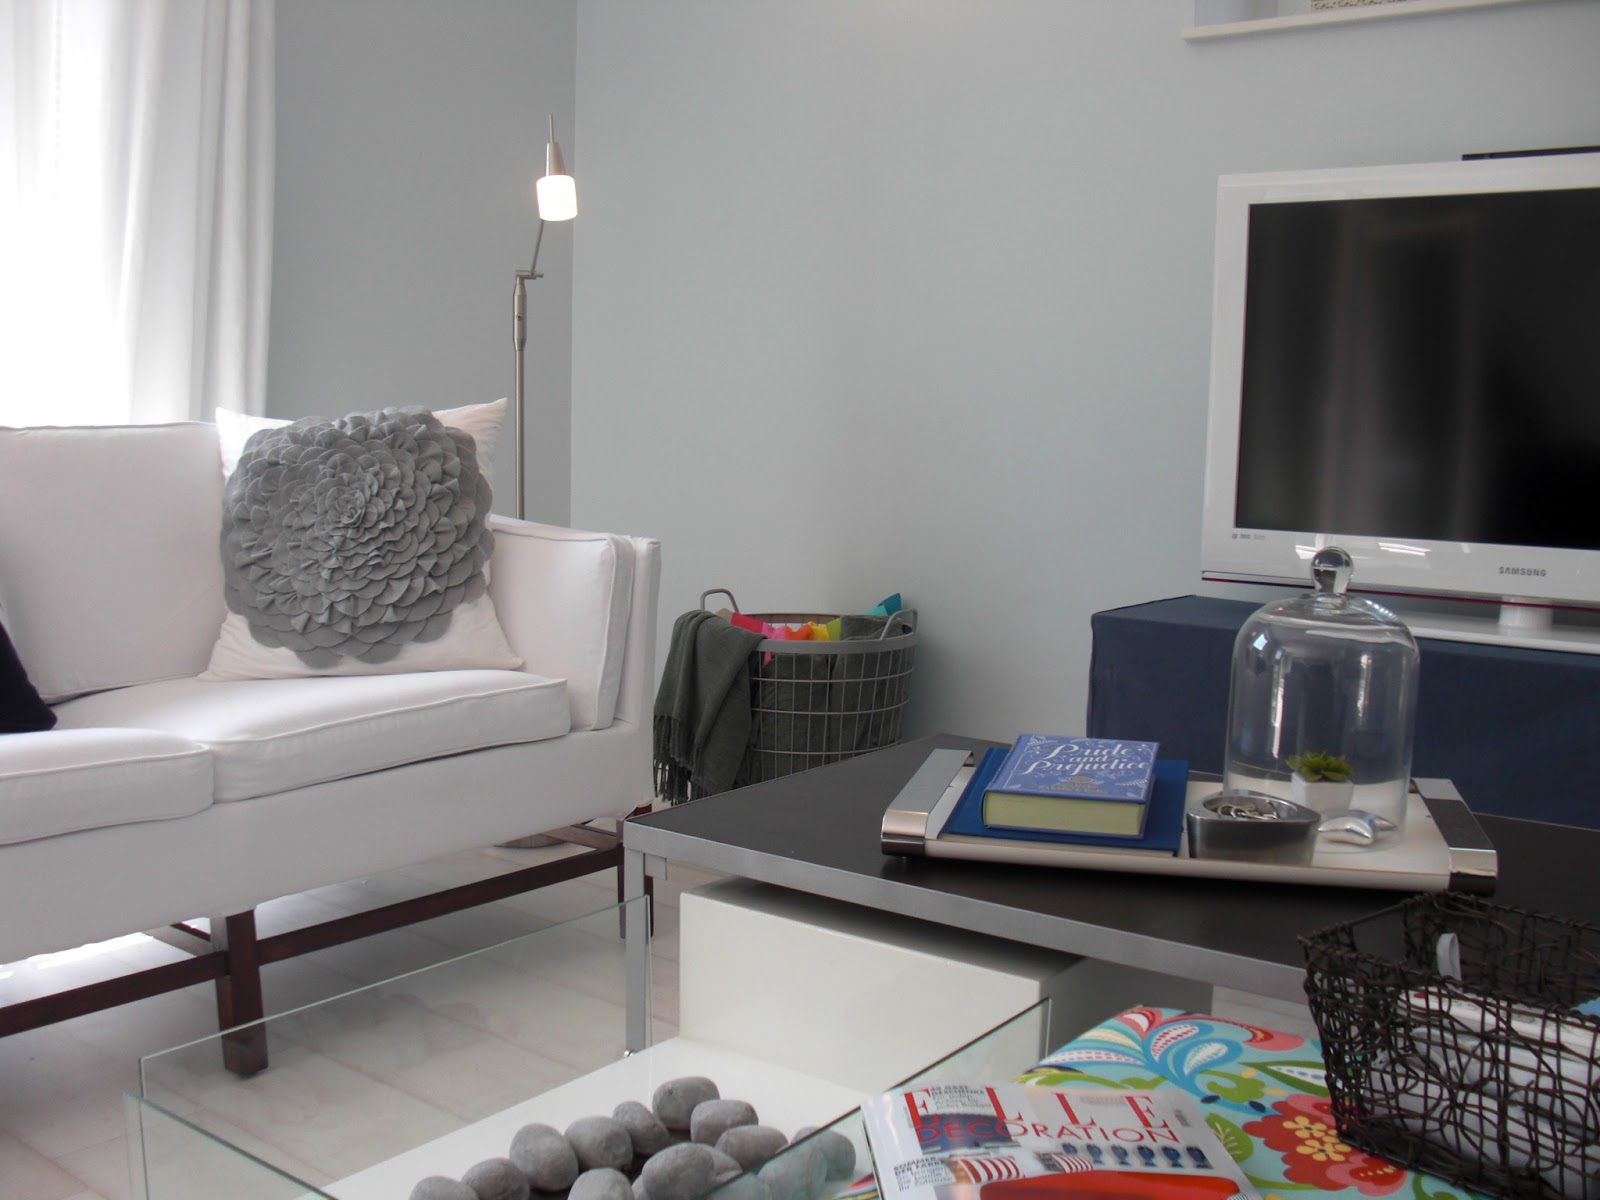 heim elich juli 2013. Black Bedroom Furniture Sets. Home Design Ideas